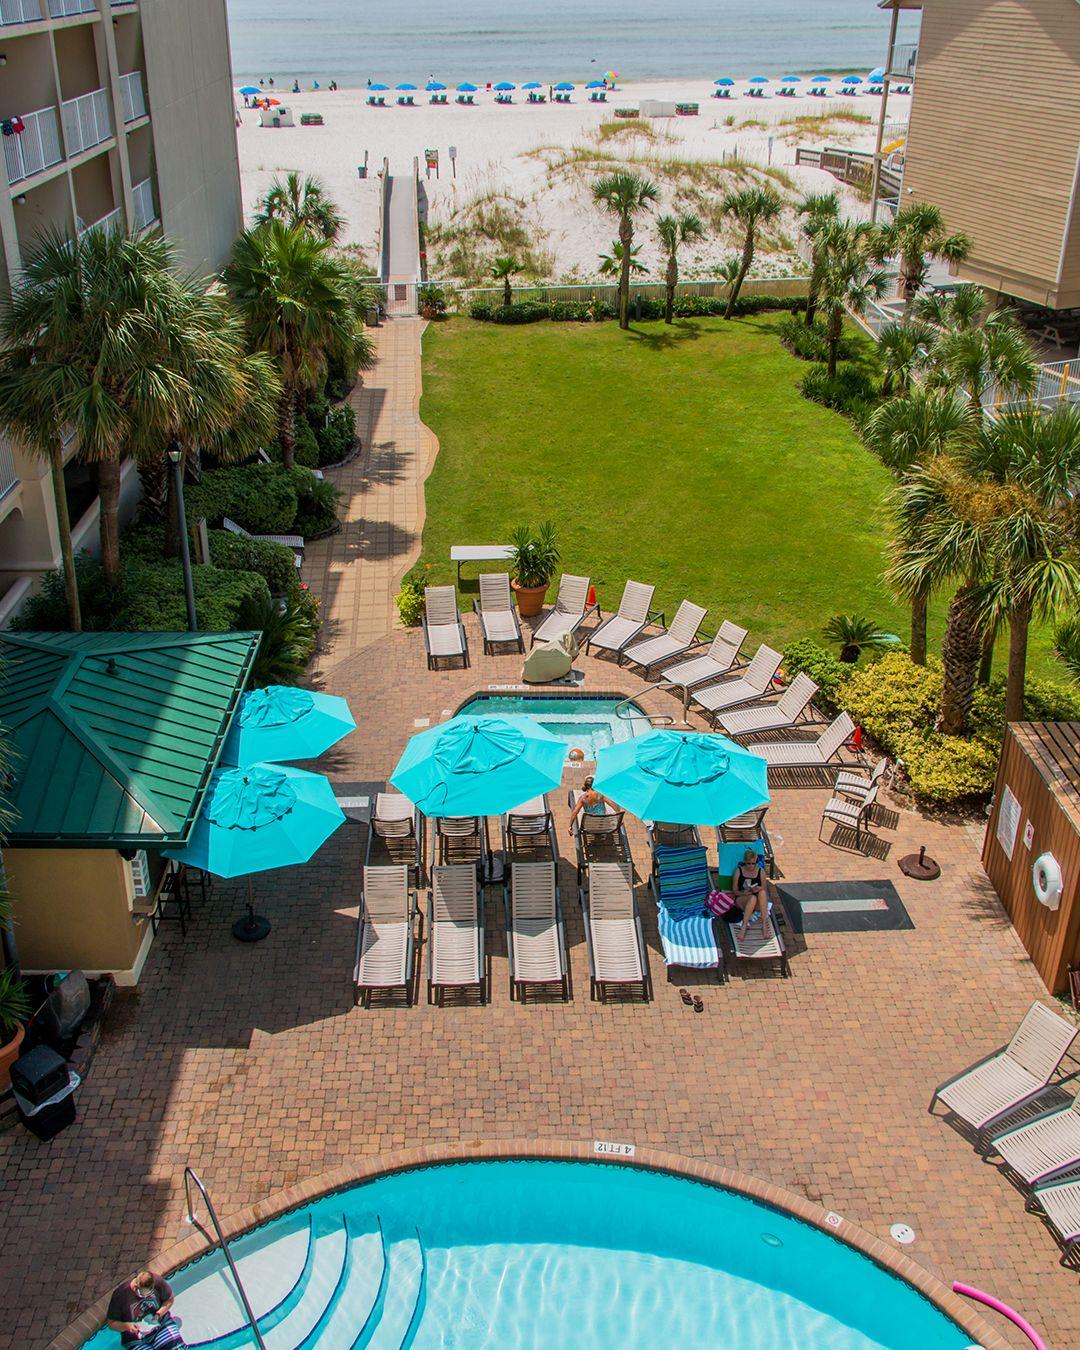 Pool Days And Sunshine Rays Orange Beach Hotels Hilton